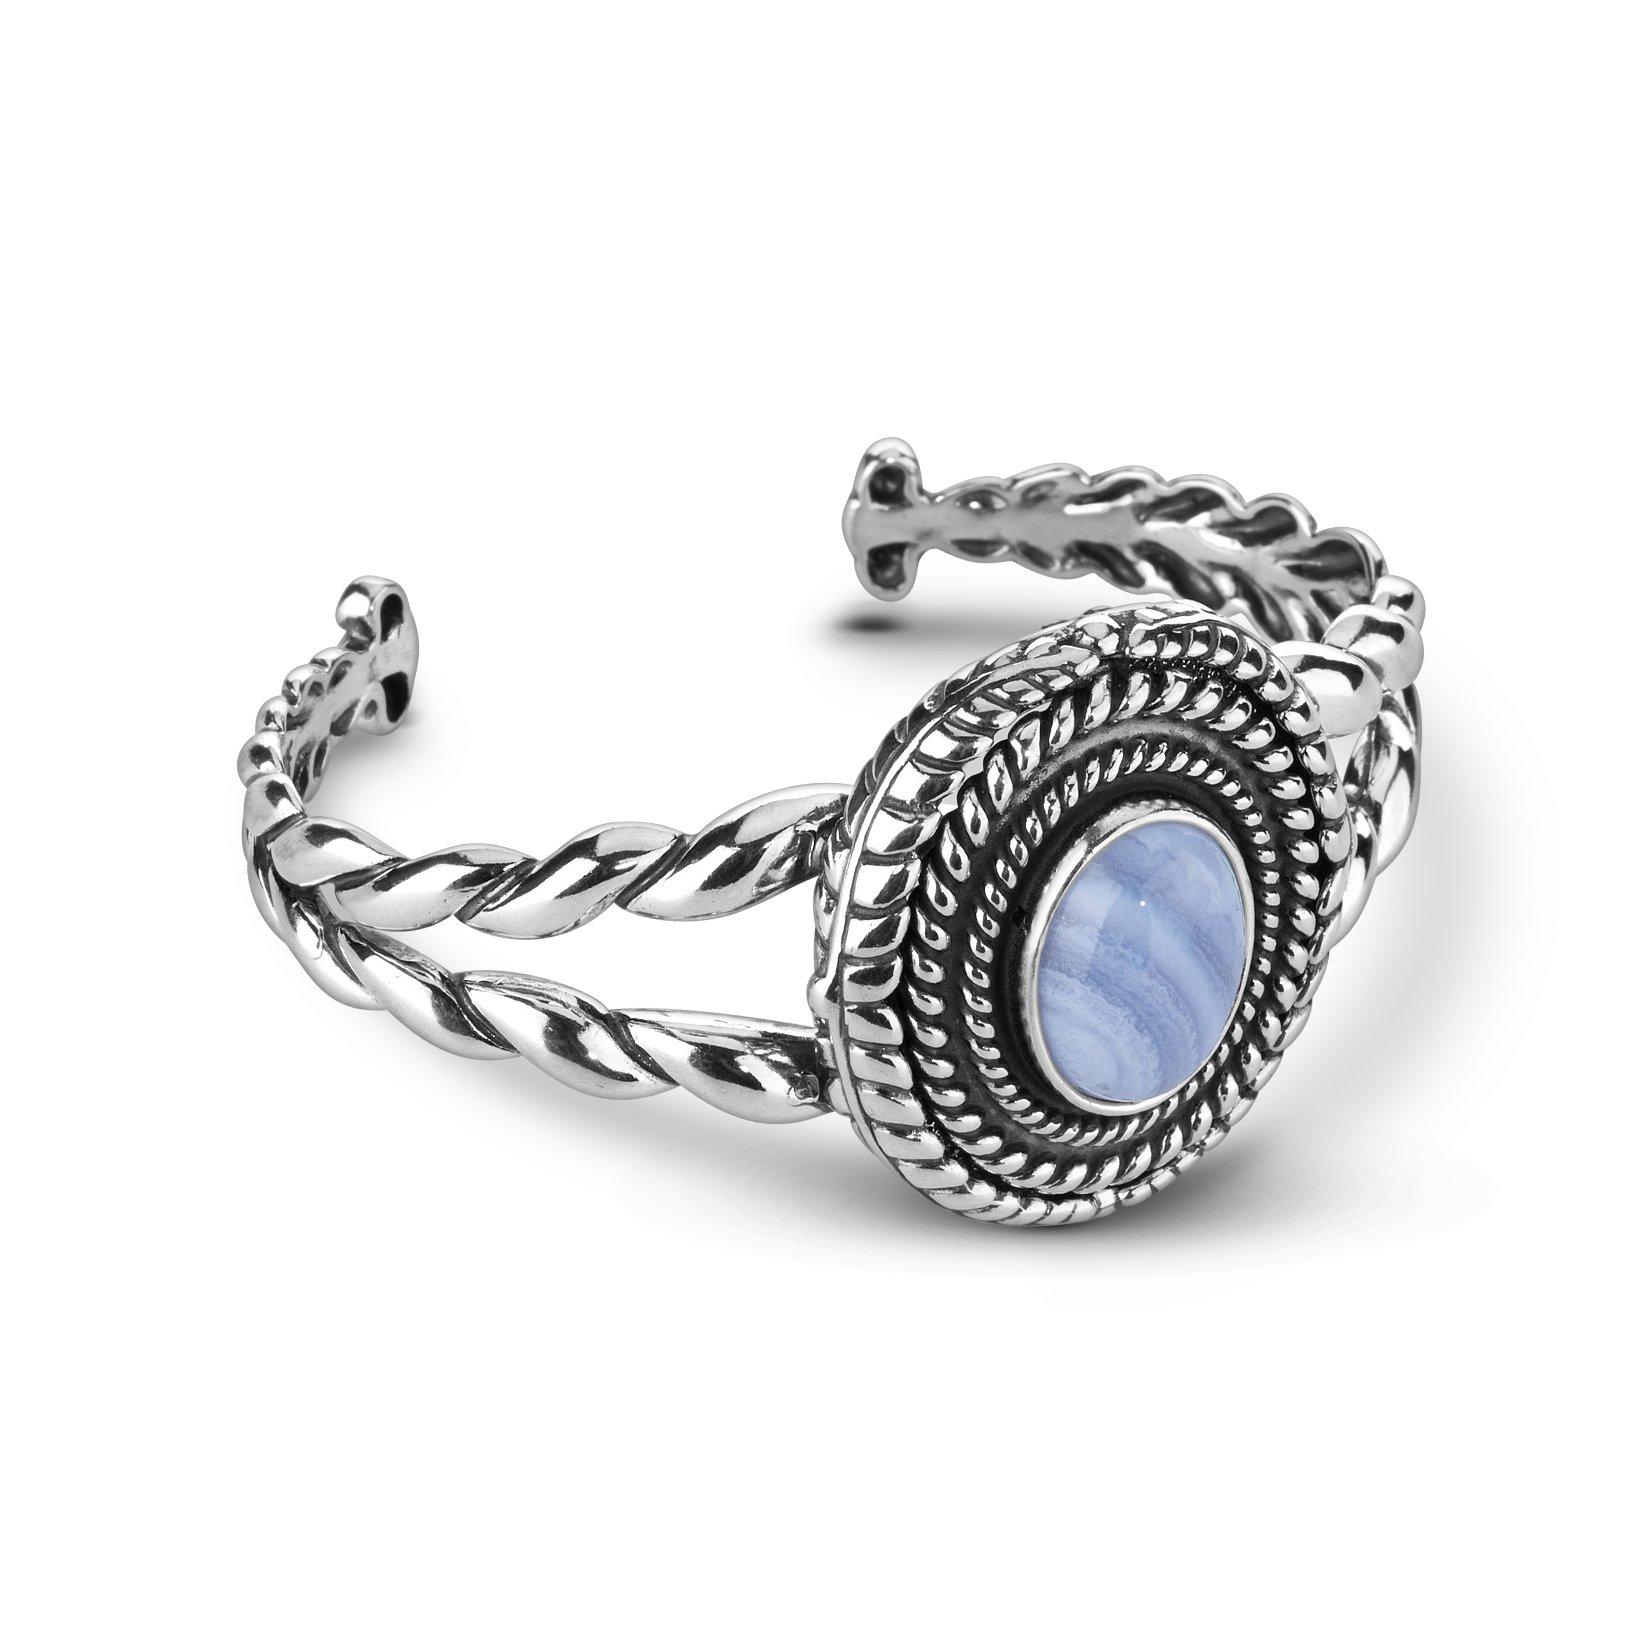 American West Genuine .925 Sterling Silver Blue Lace Agate Interchangeable Cuff Bracelet